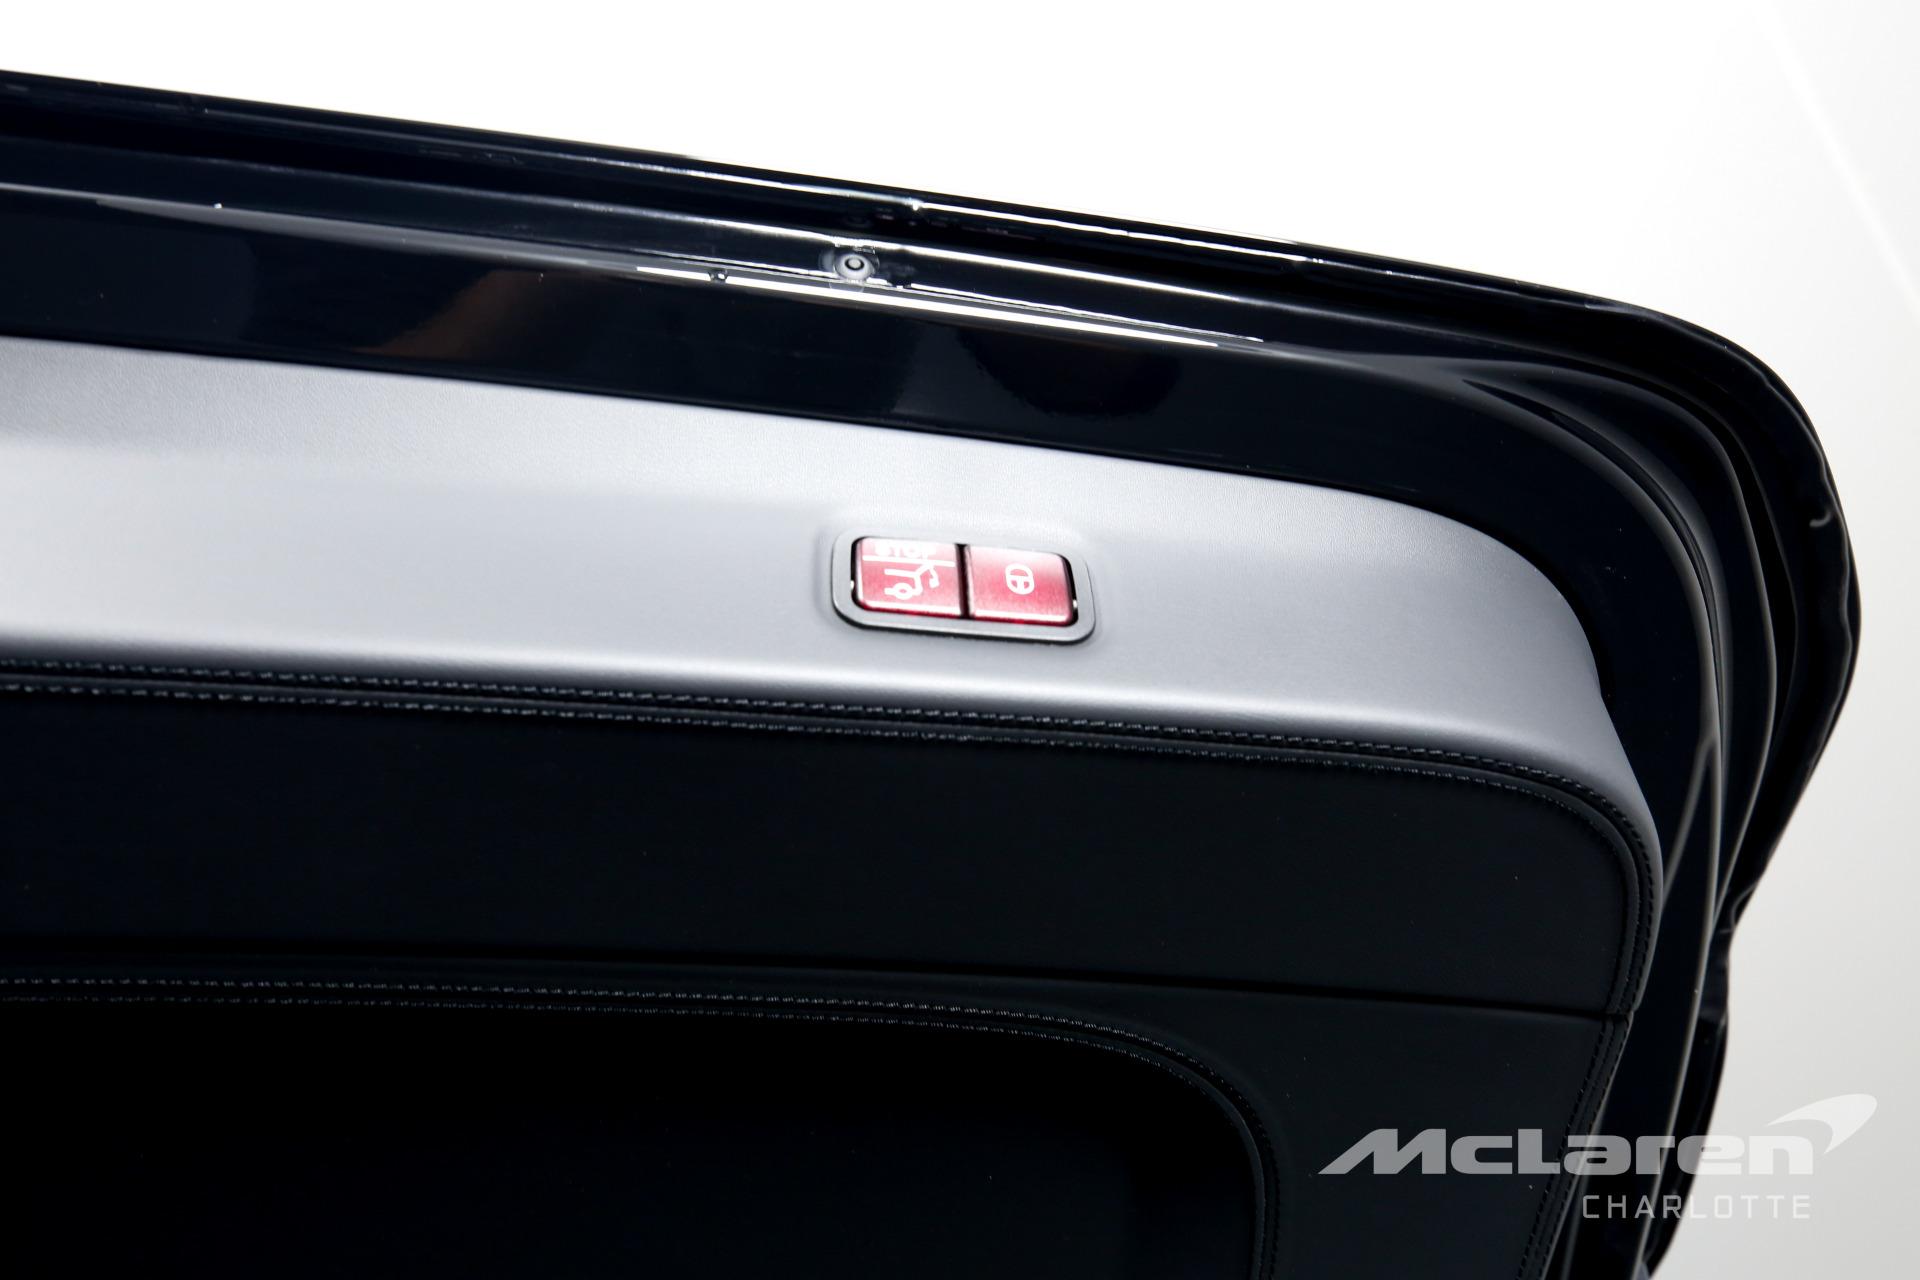 Used 2021 Mercedes-Benz GLS Mercedes-Maybach GLS 600 4MATIC | Charlotte, NC